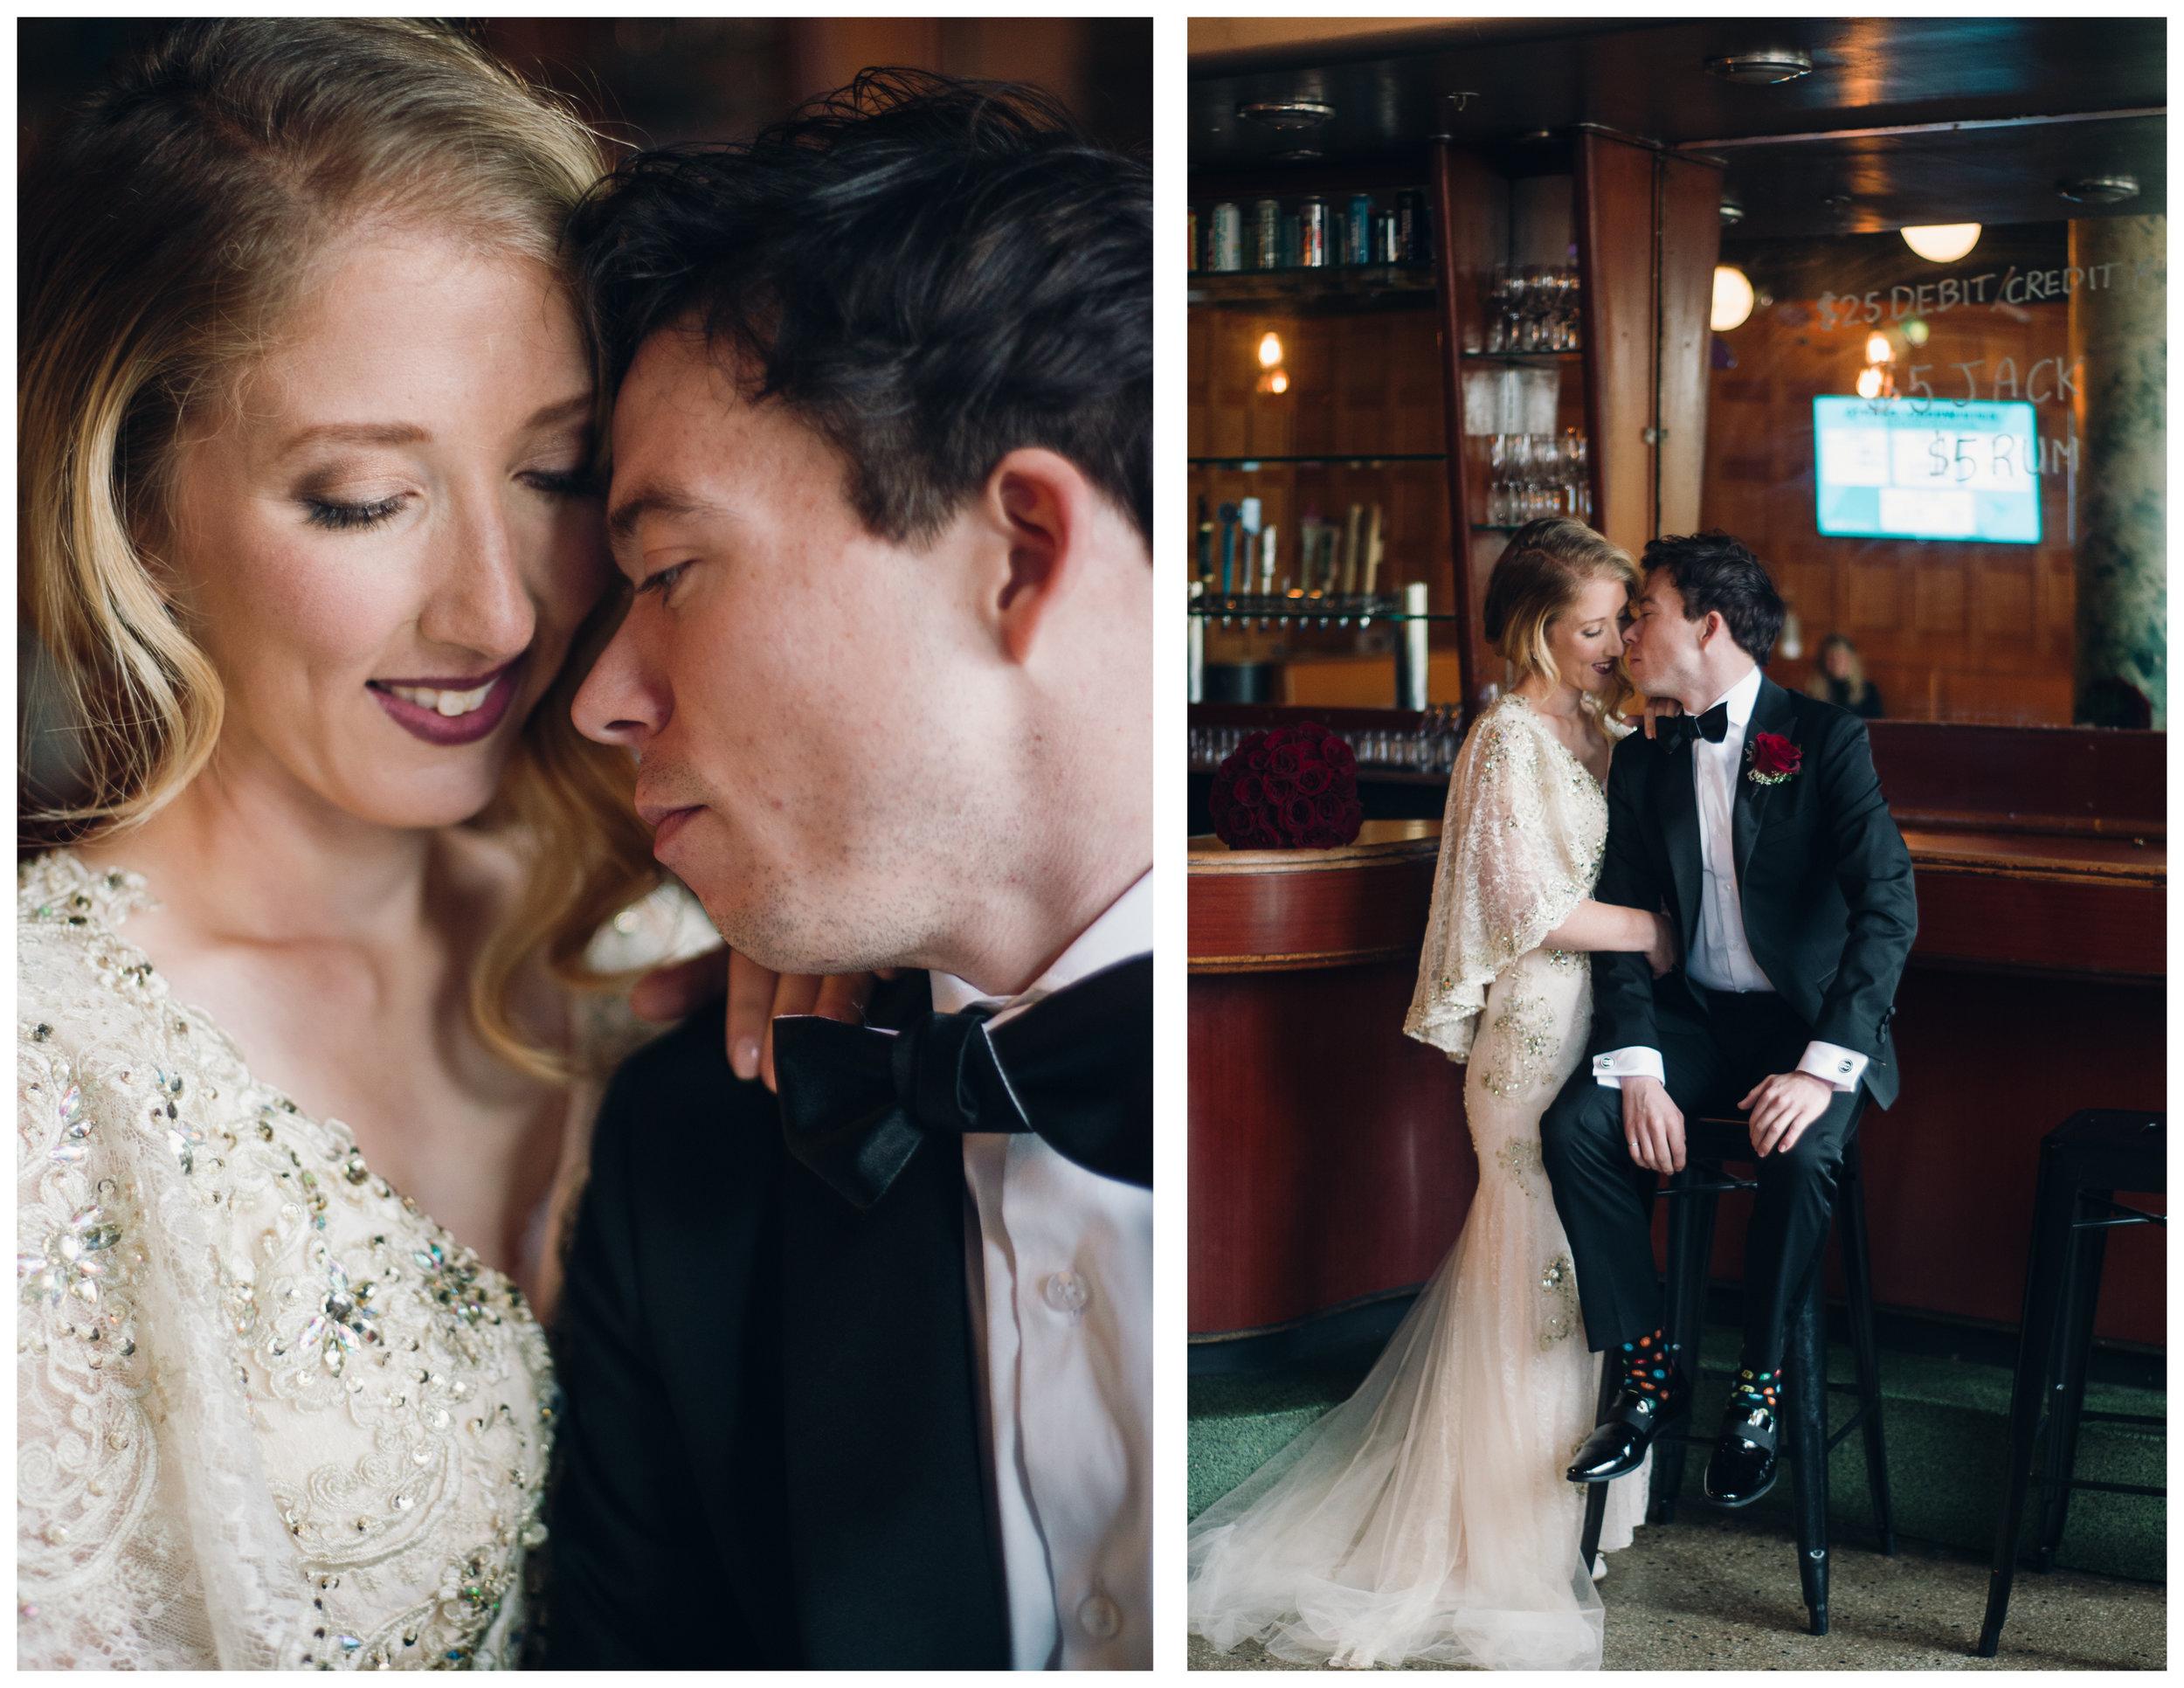 Gladstone Great Gastby Wedding 2x2_10.jpg